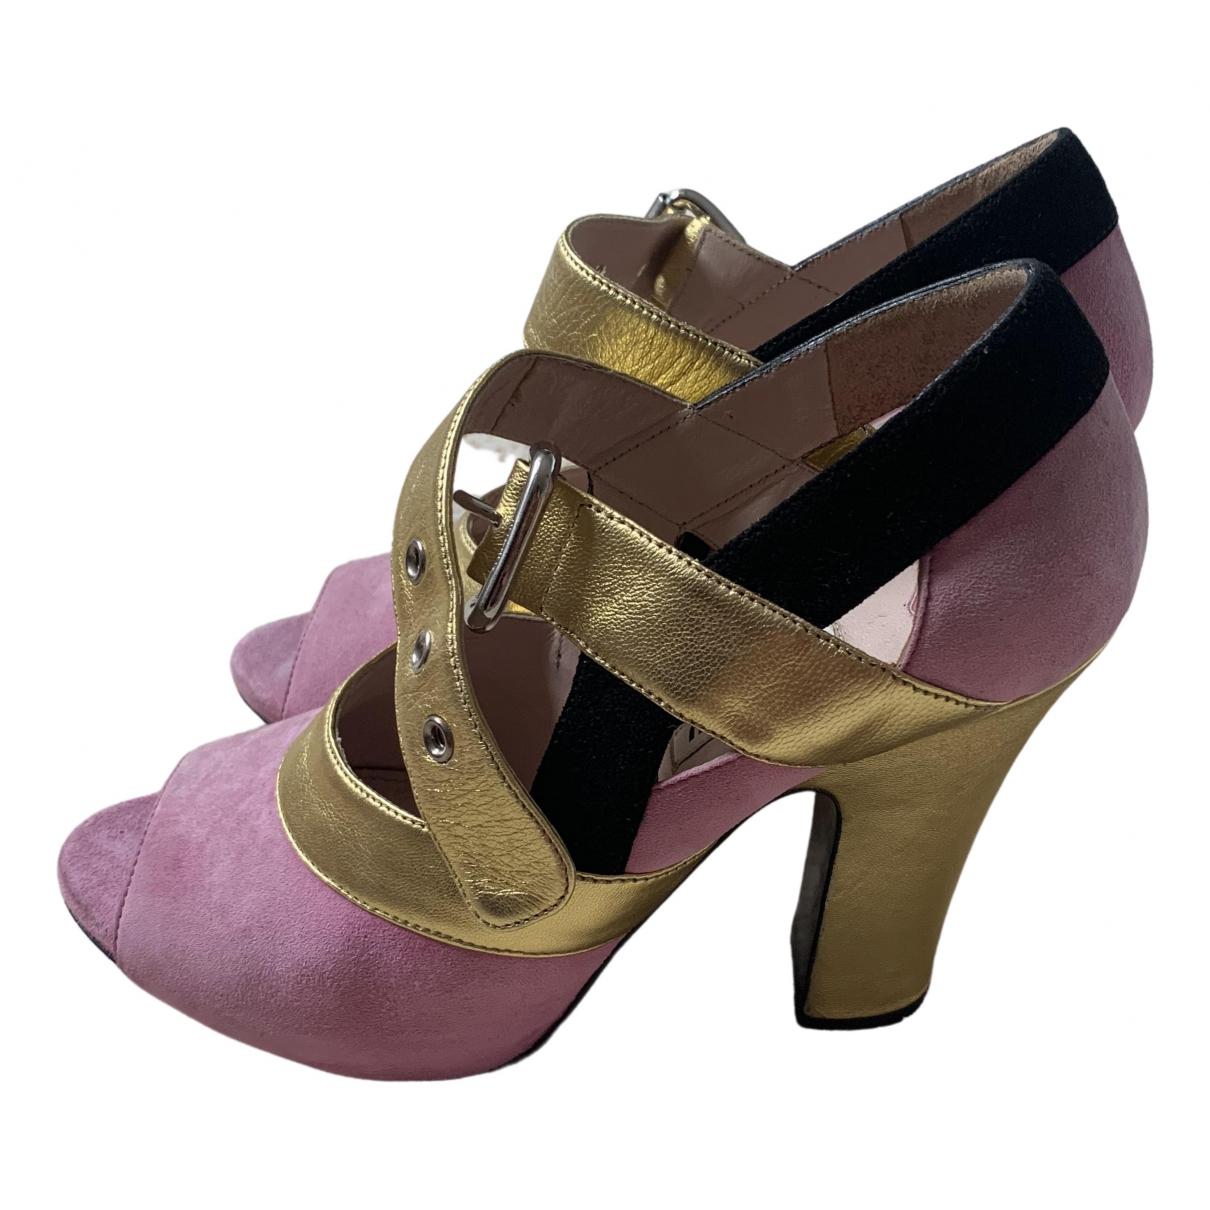 Miu Miu \N Pink Suede Sandals for Women 38 IT